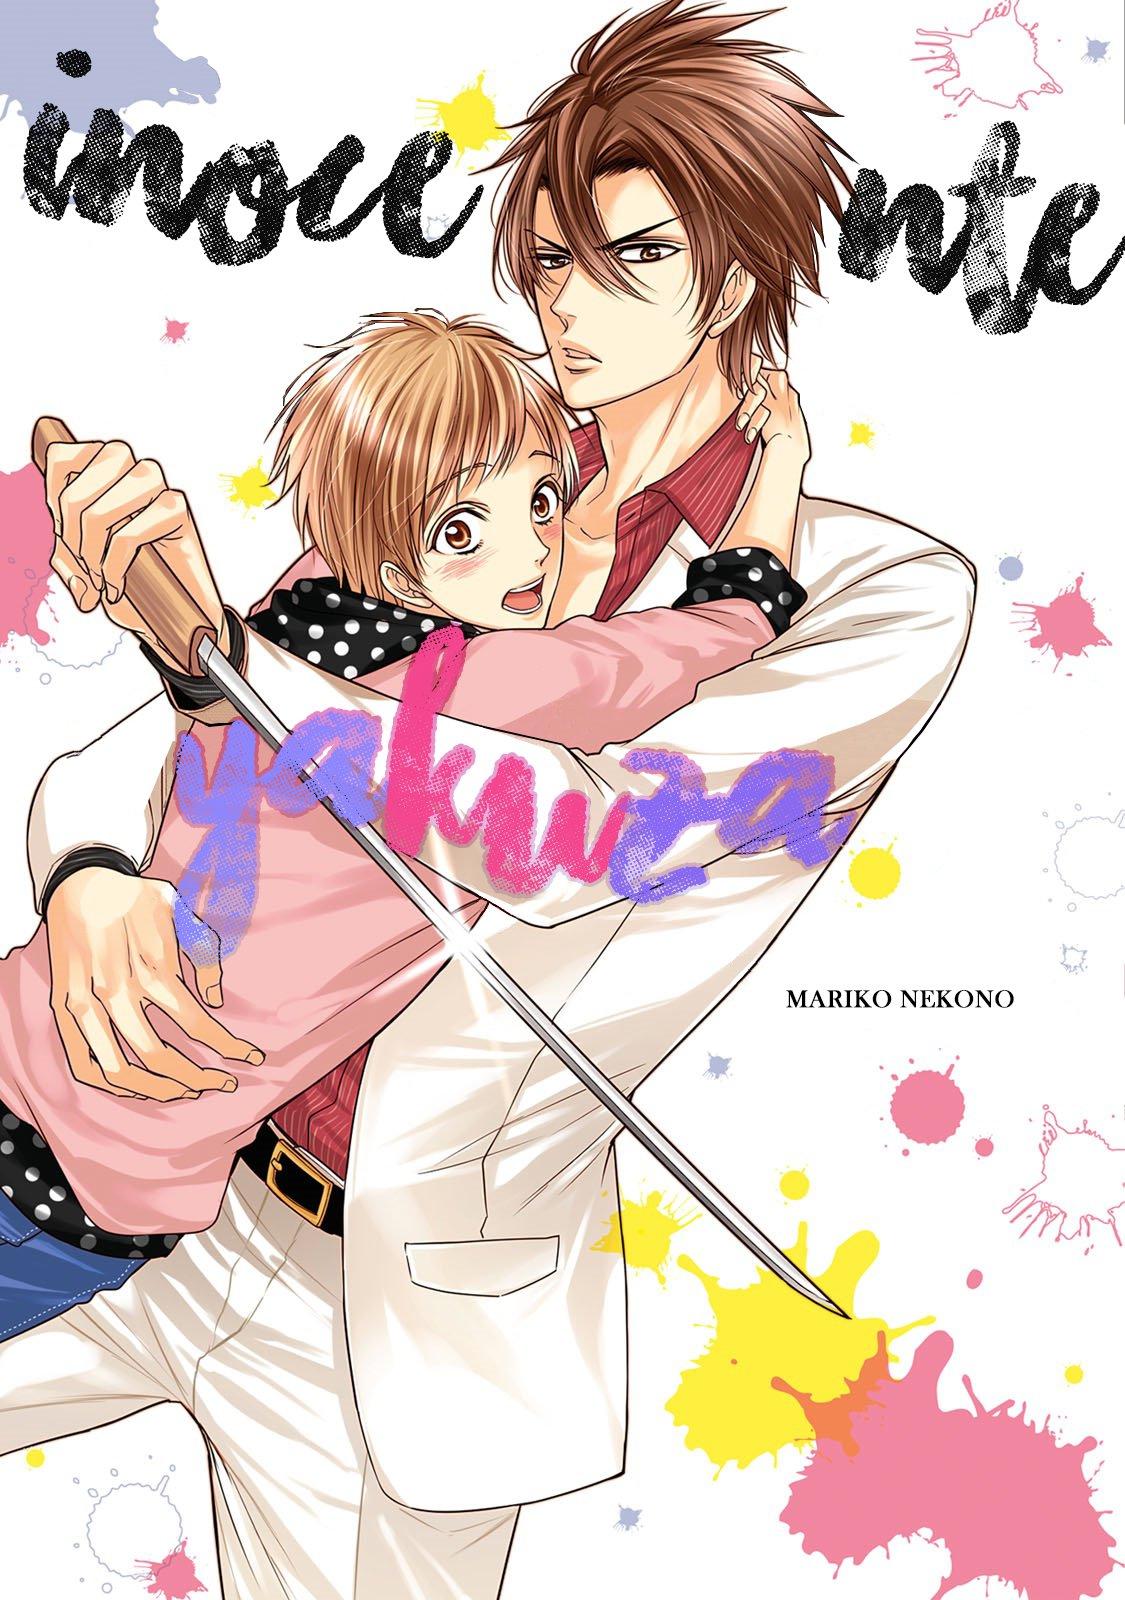 https://nine.mangadogs.com/es_manga/pic9/30/37726/972274/ca4f76fc1601927e425f9487890361a6.jpg Page 1